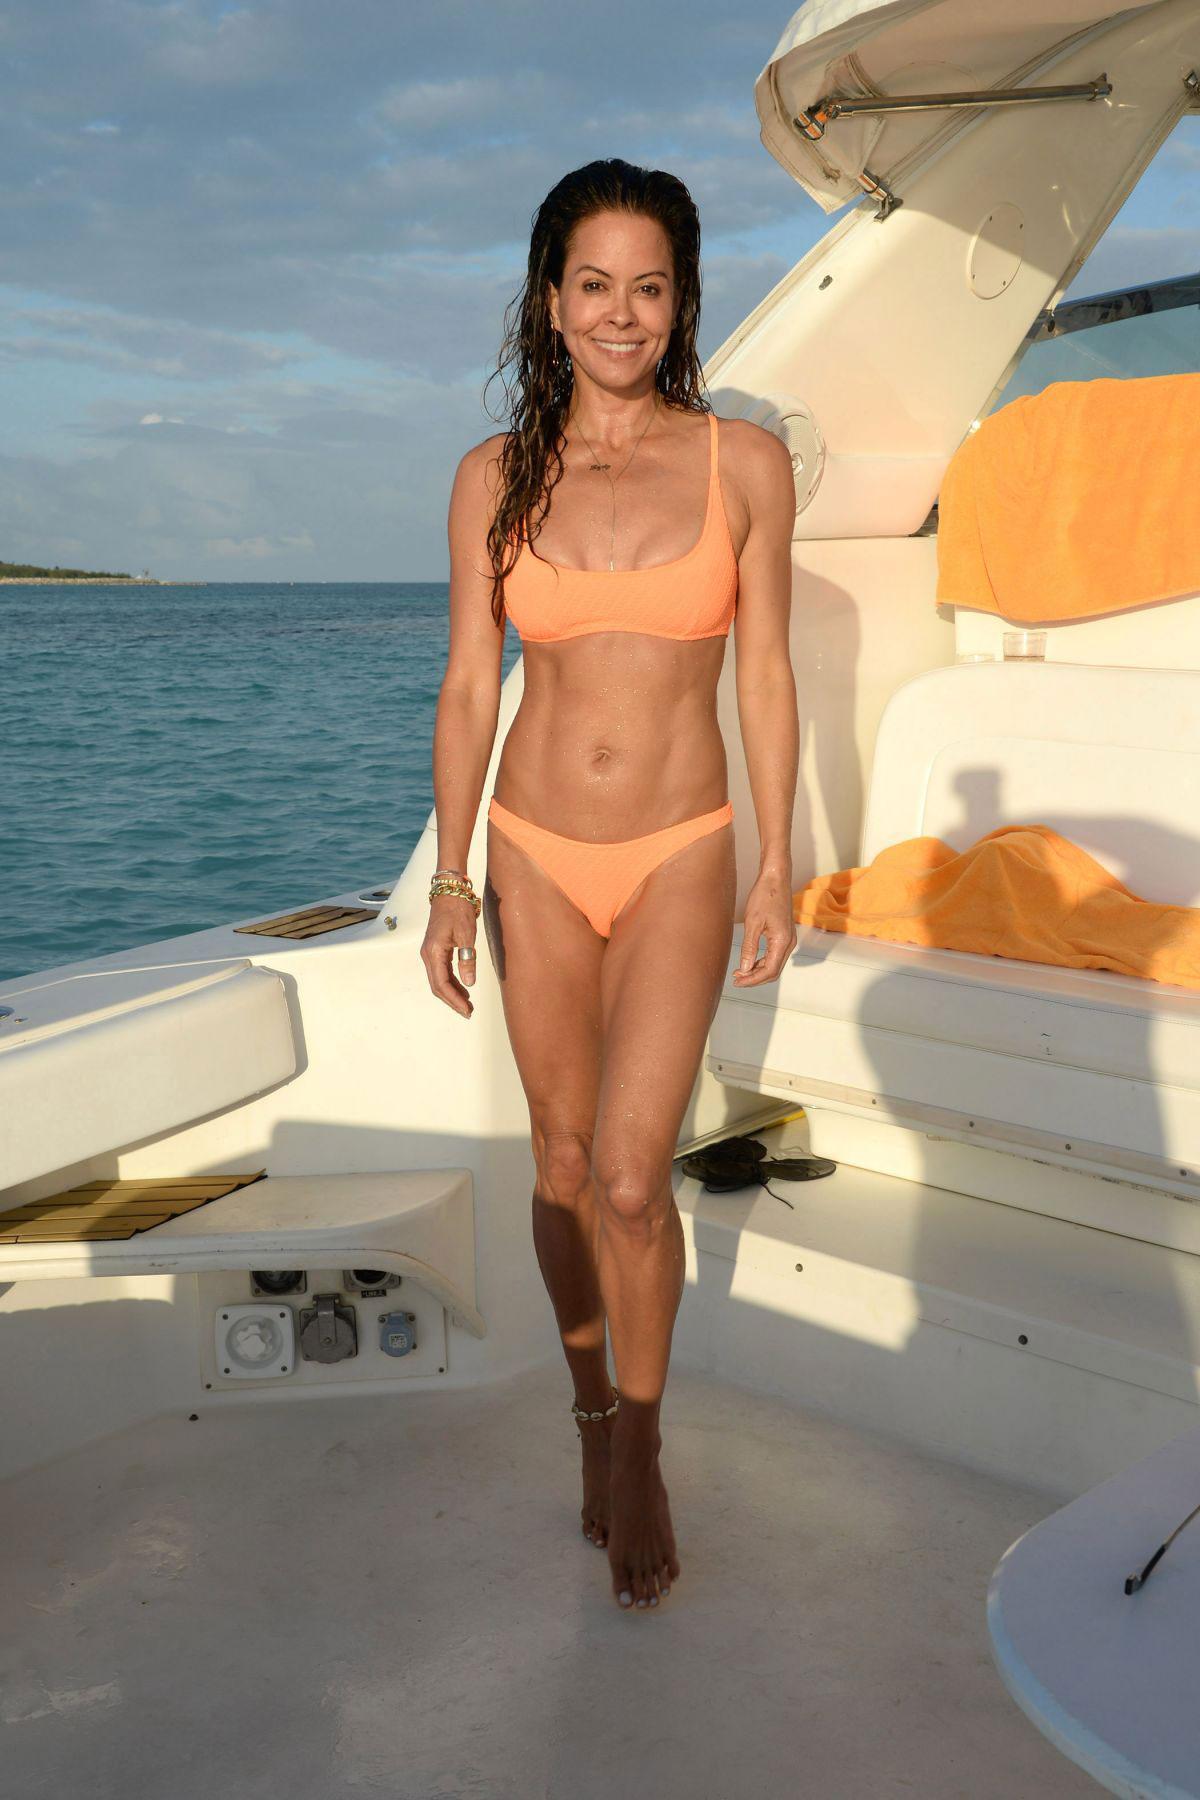 brooke burke in a bikini